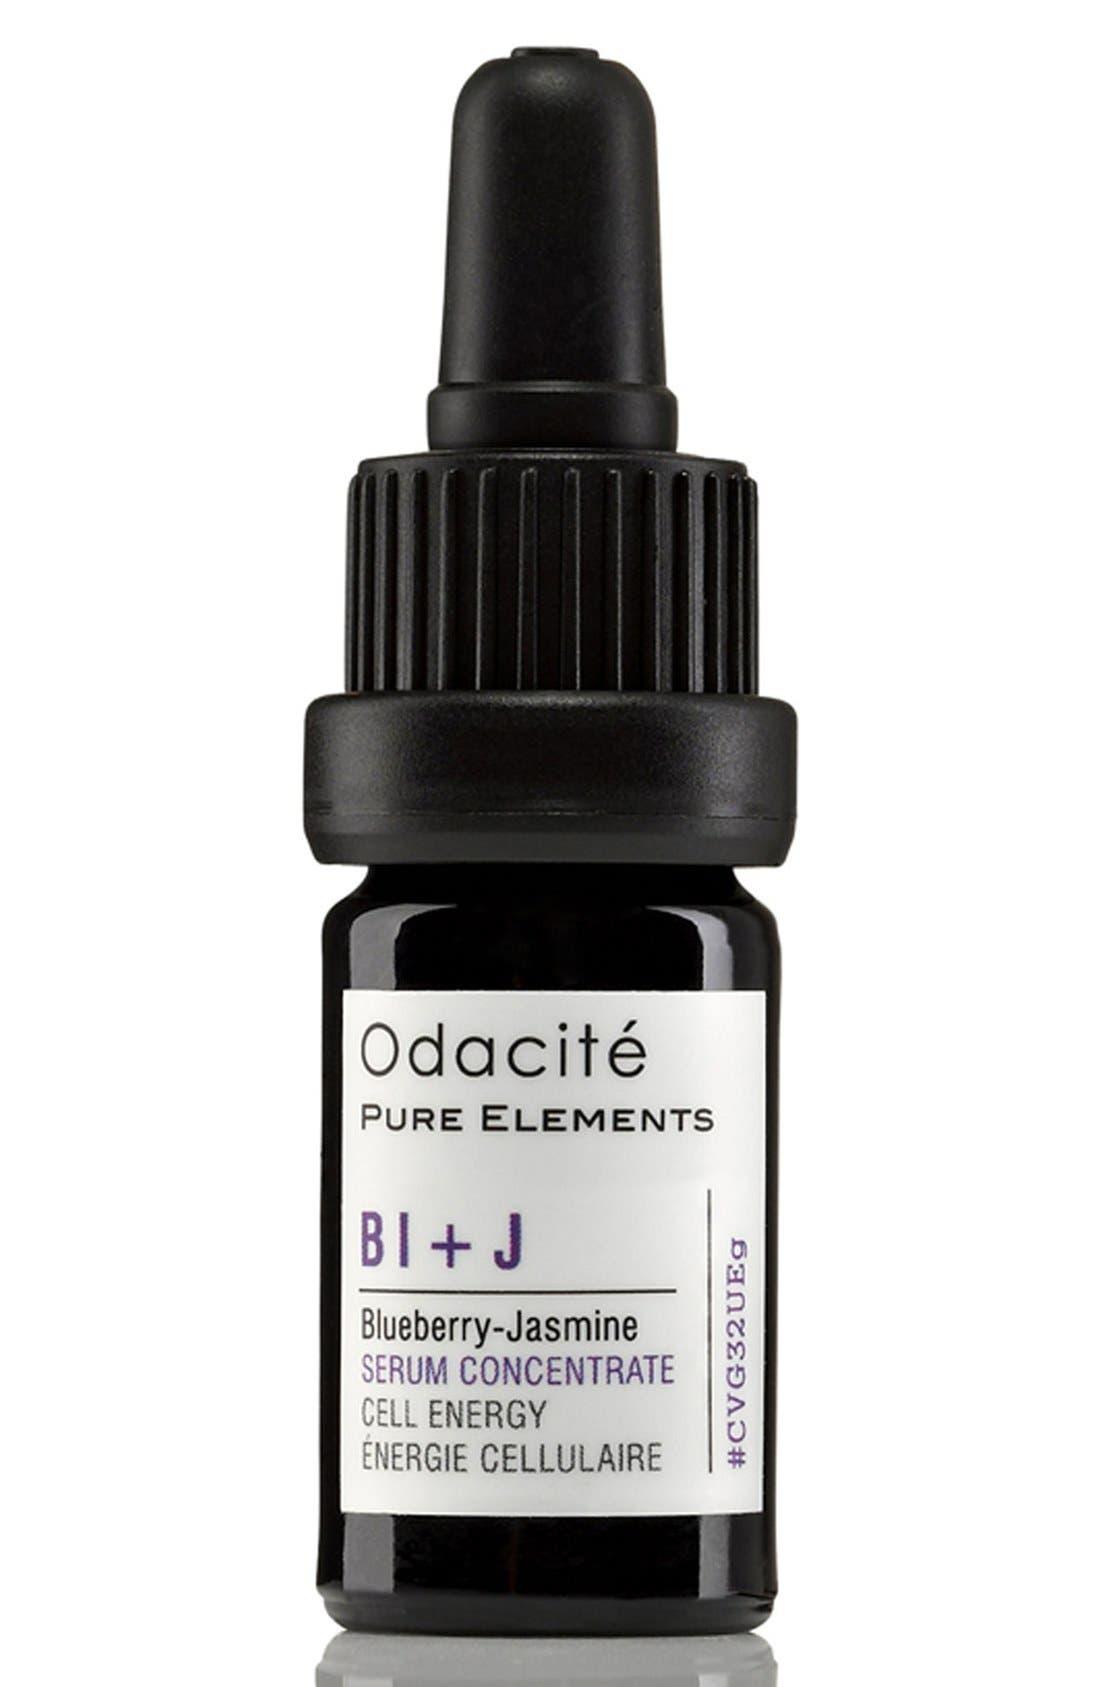 Odacité Bl + J Blueberry-Jasmine Cell Energy Serum Concentrate